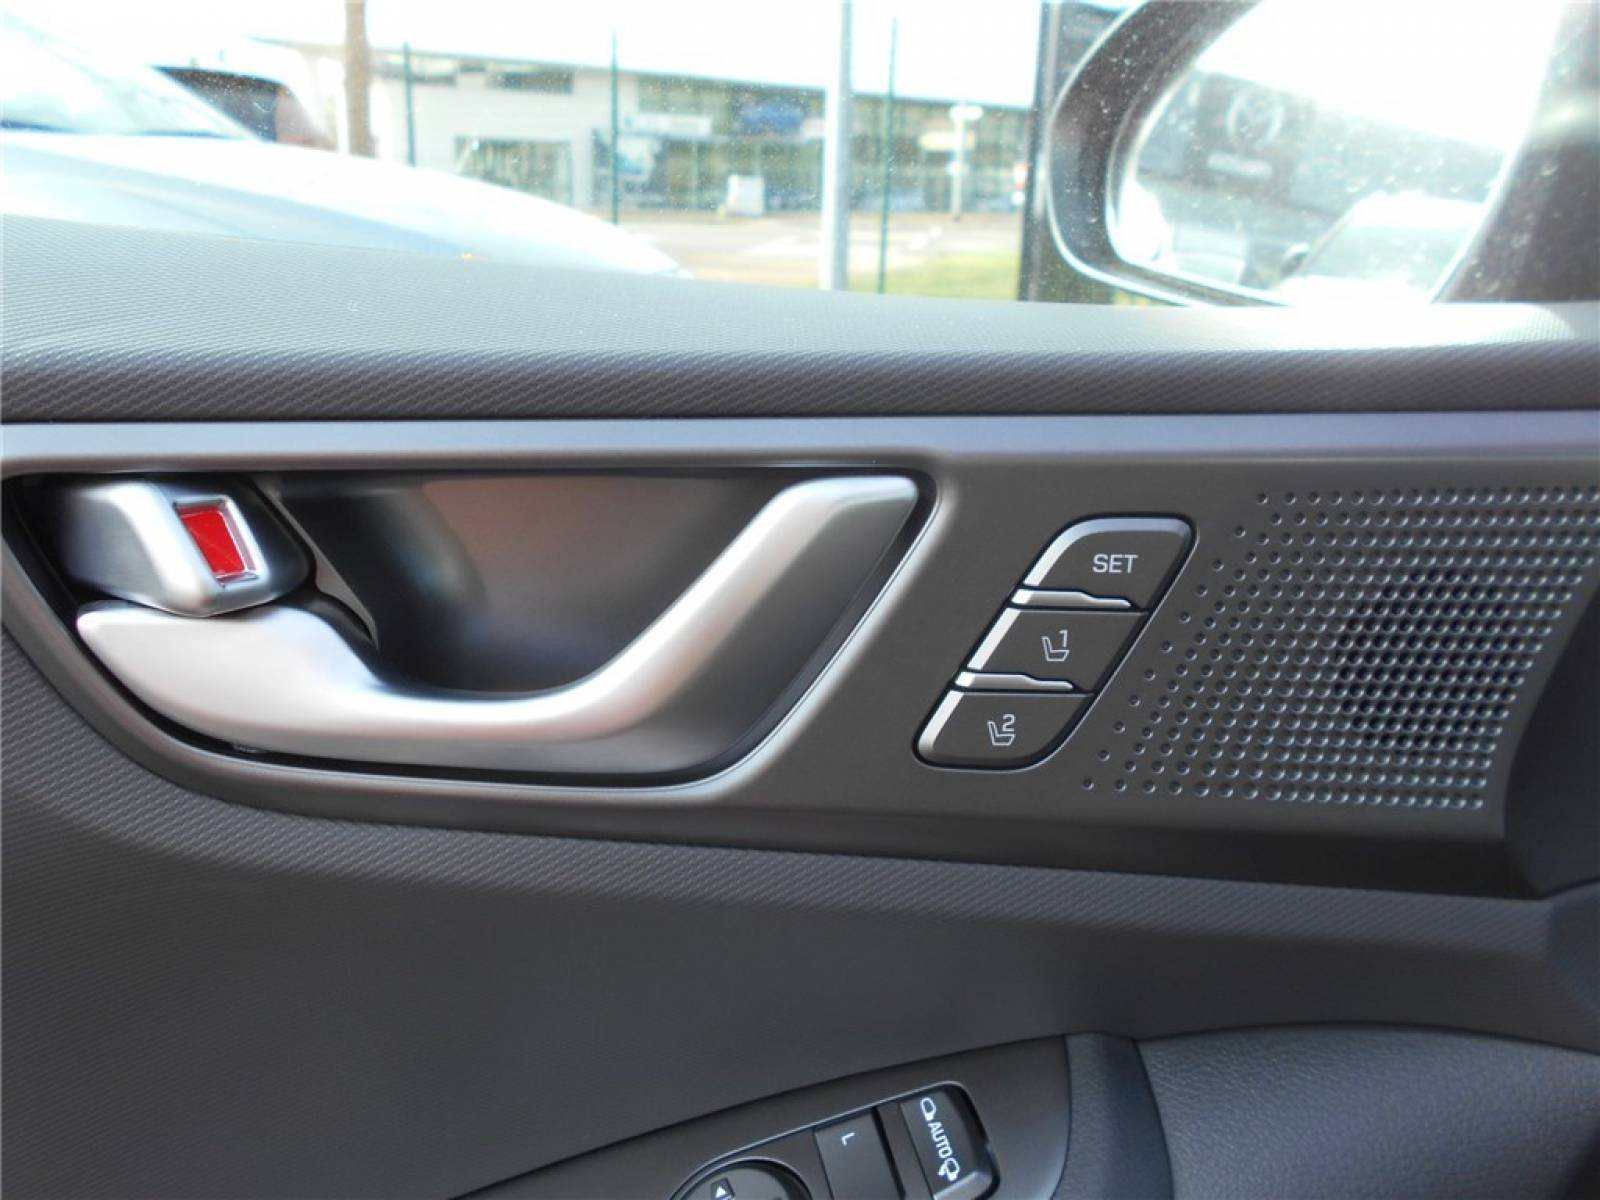 HYUNDAI Ioniq Plug-in 141 ch - véhicule d'occasion - Groupe Guillet - Chalon Automobiles - 71100 - Chalon-sur-Saône - 20